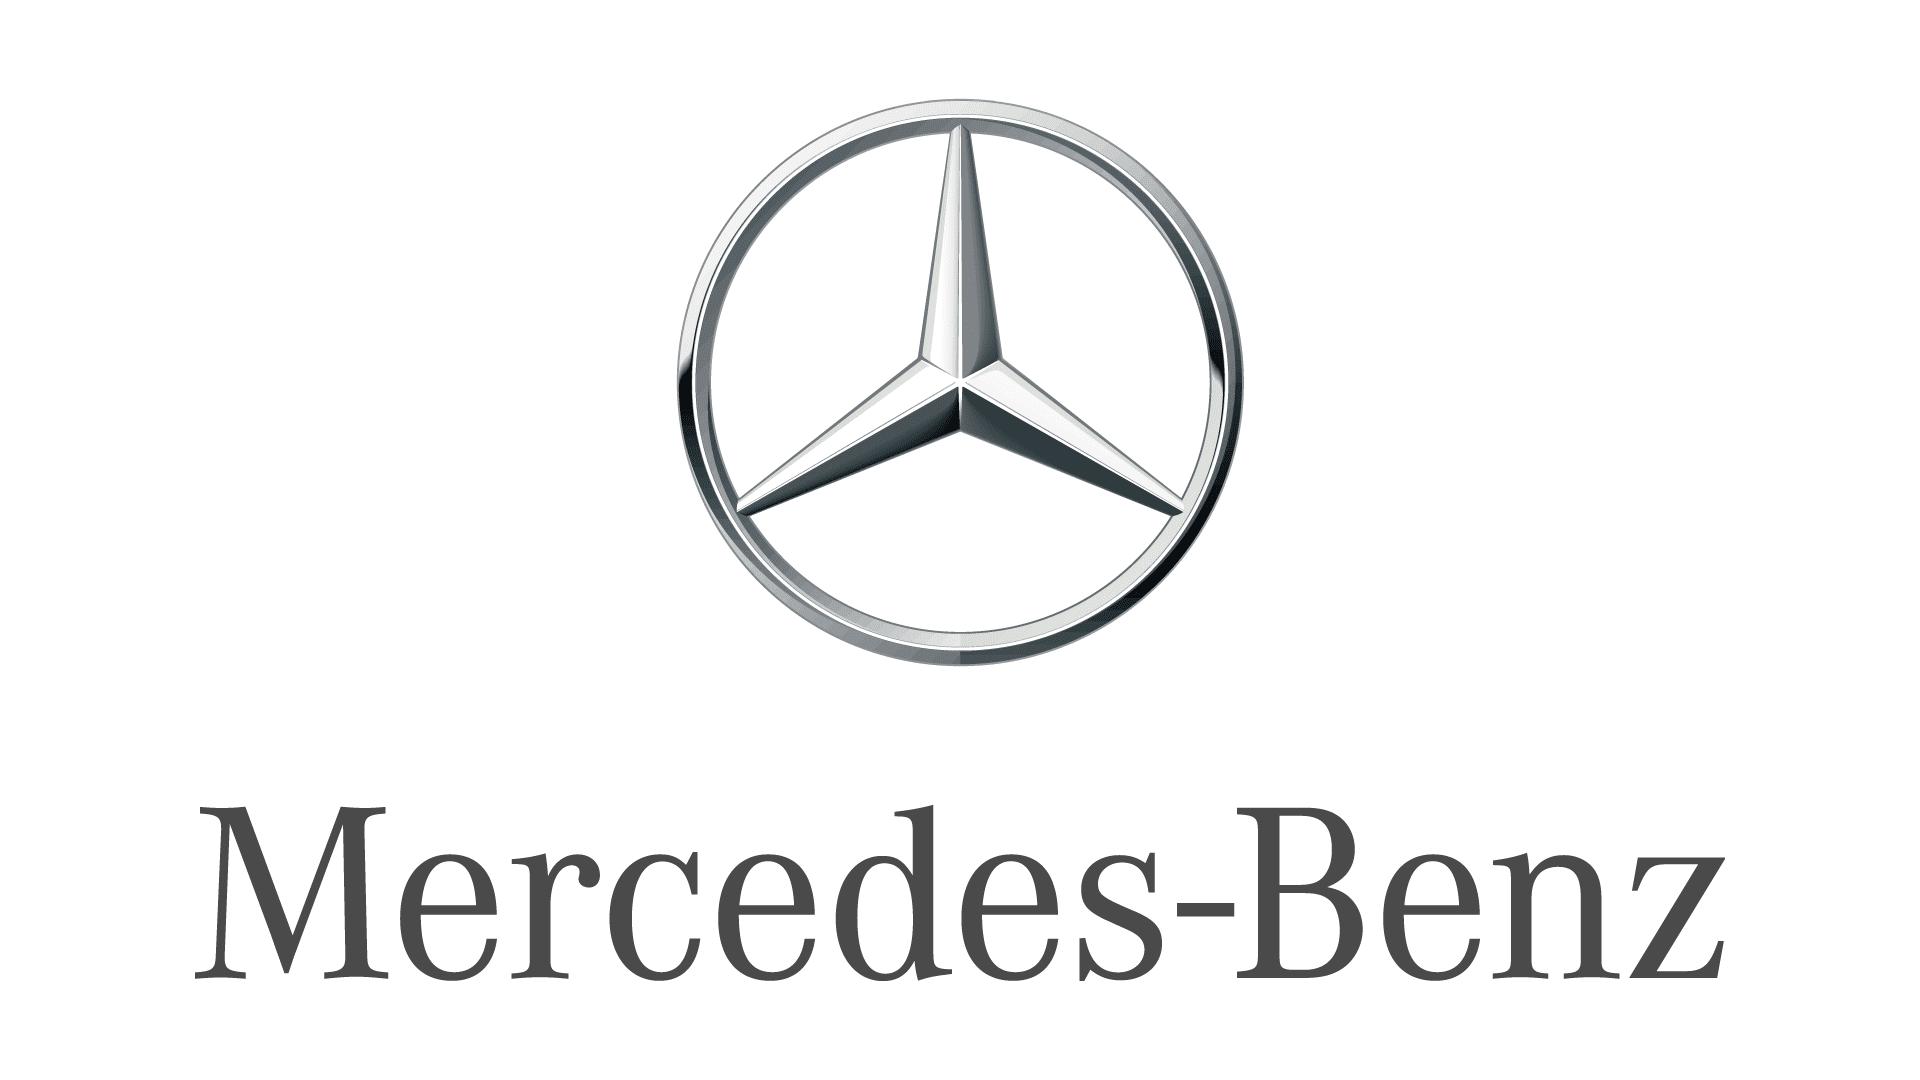 Significado del logo de Mercedes Benz